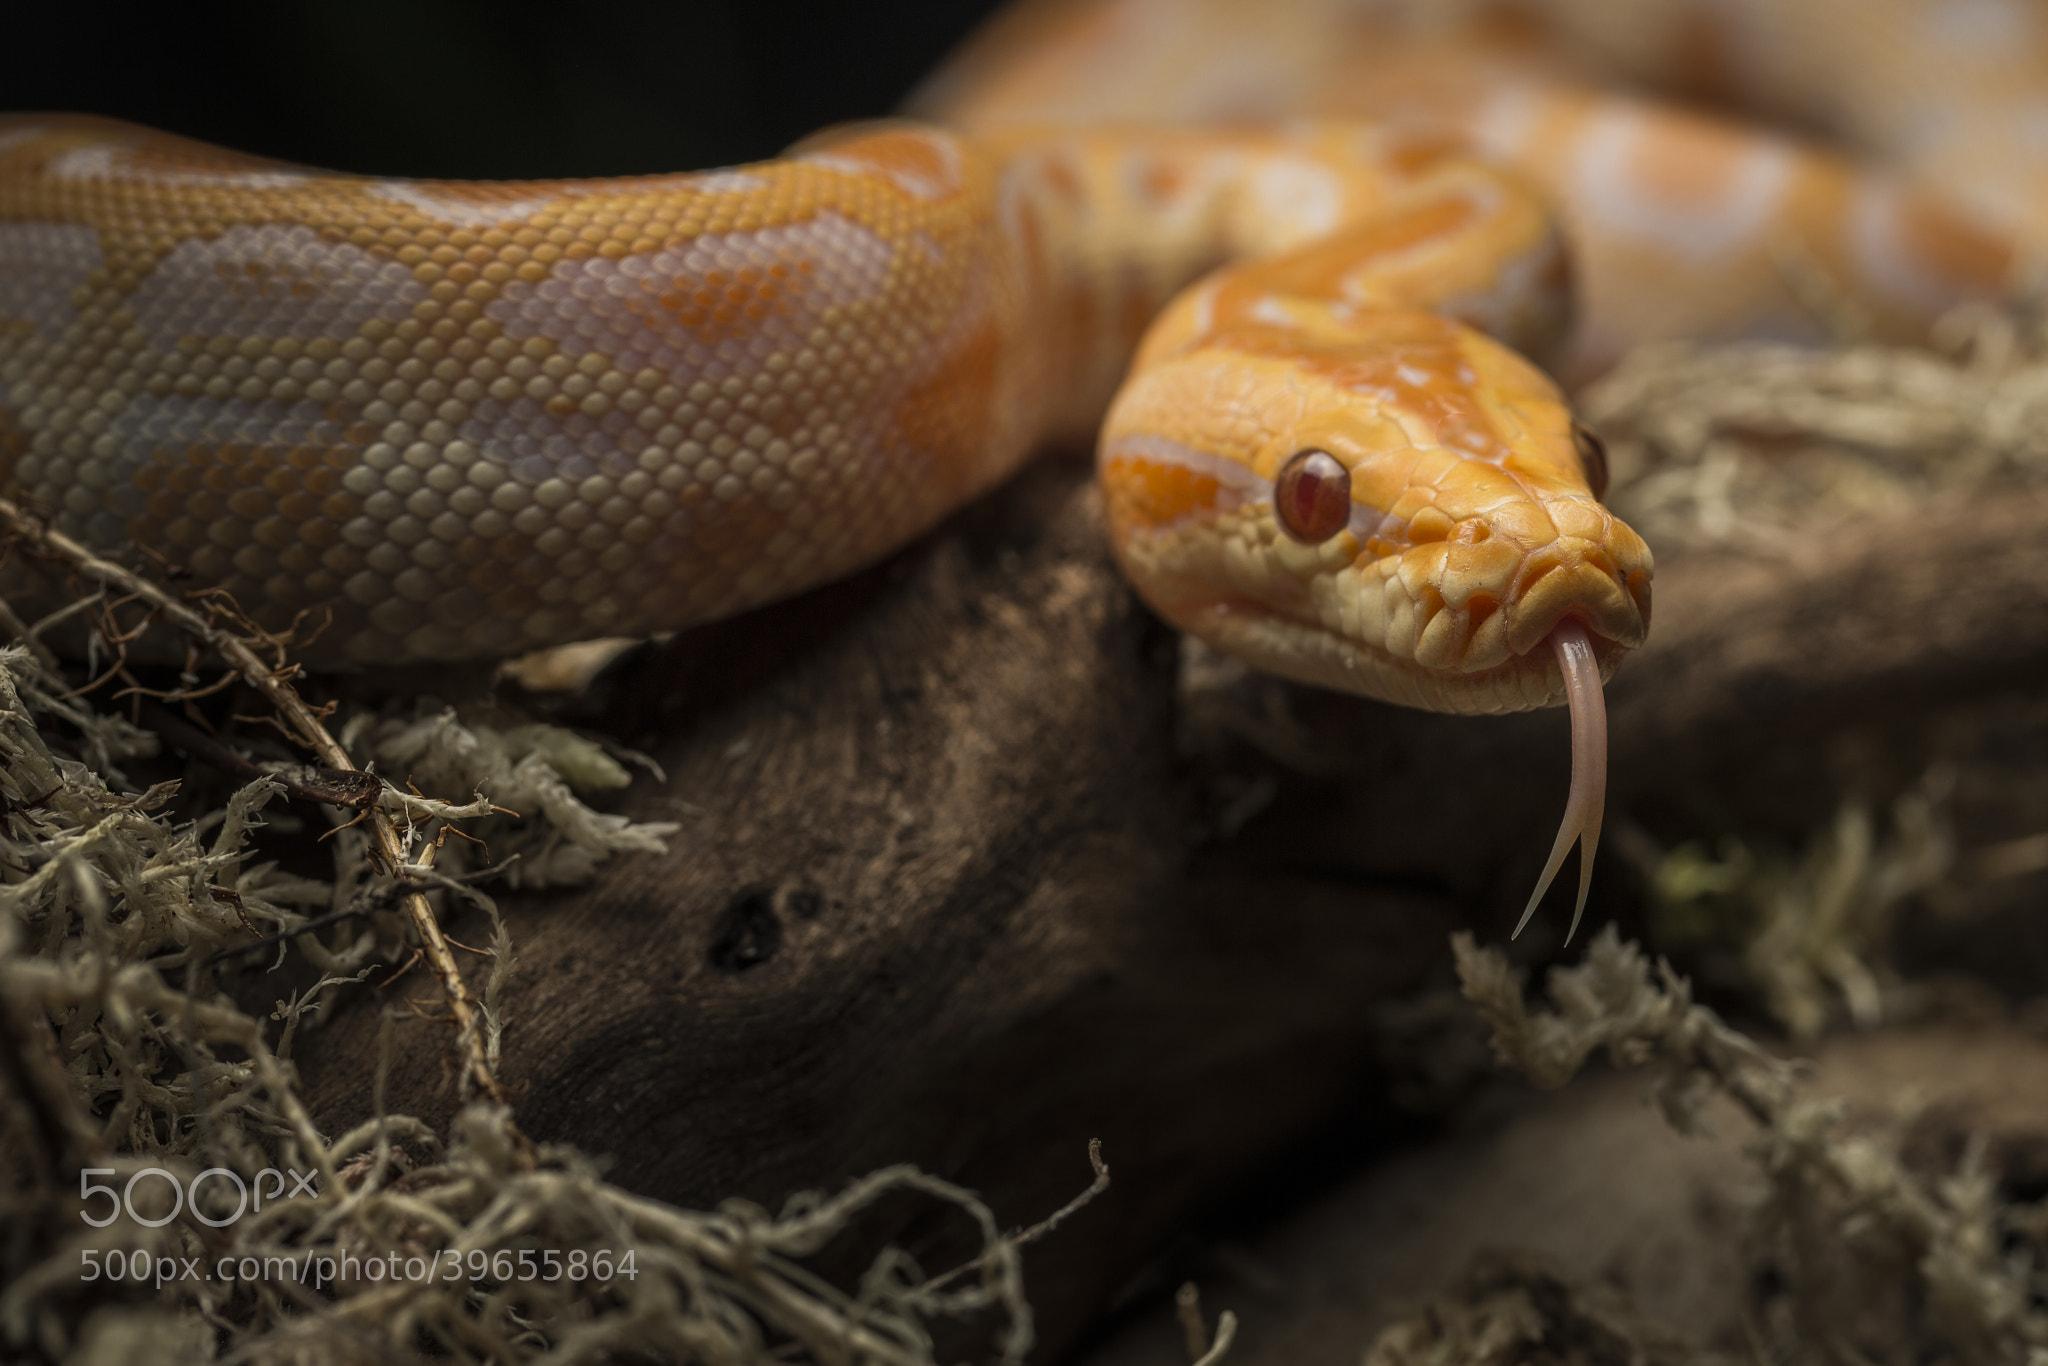 Photograph Albino Burmese Python by Yousef Zaman on 500px